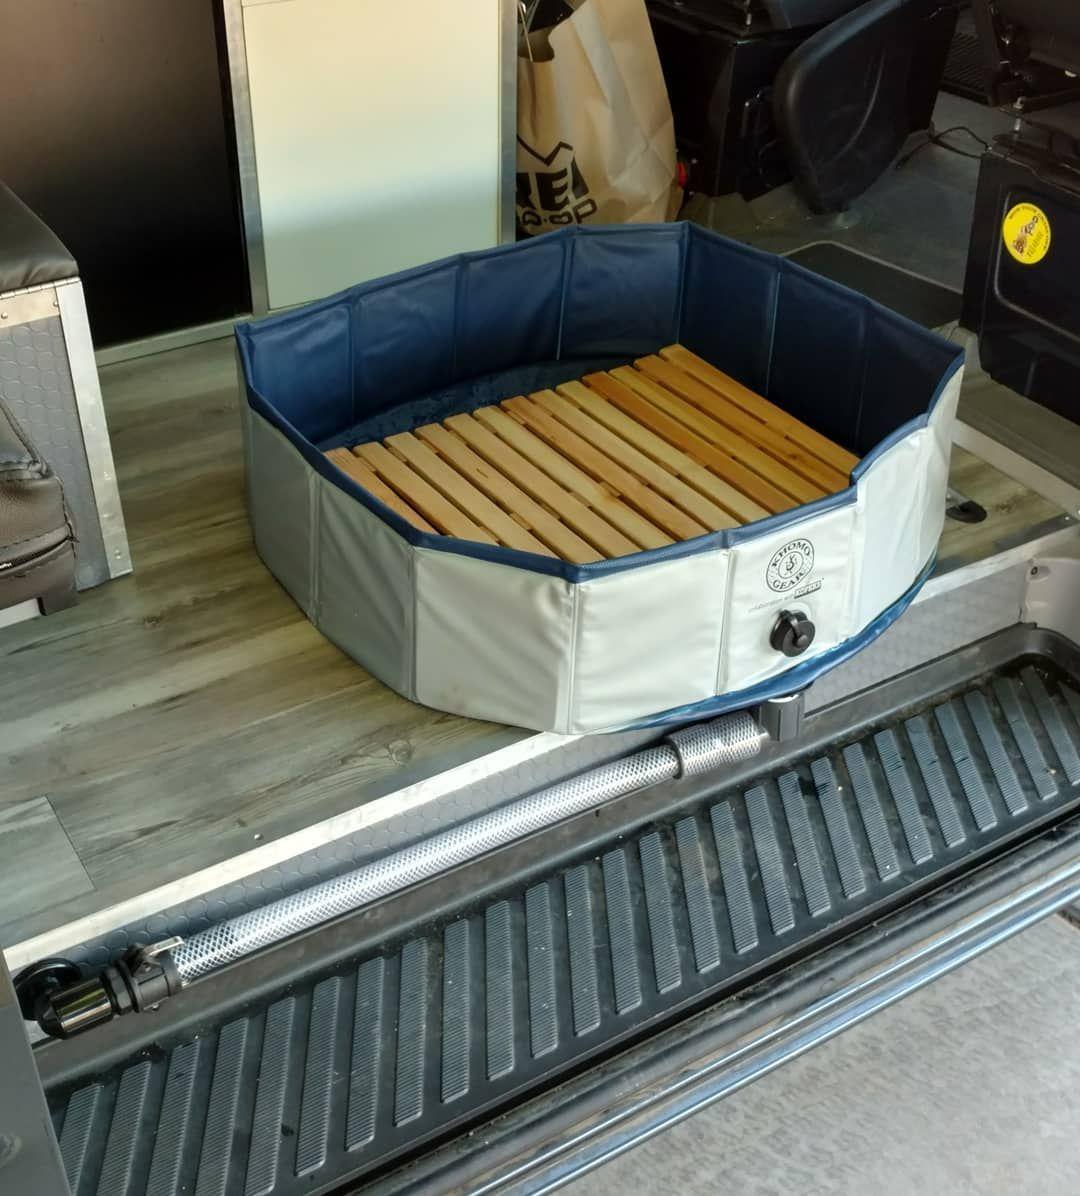 Diy Portable Indoor Van Shower Collapsiblespace Savinglight Weightexterior Drain We Use Bio Frie Kastenwagen In Wohnmobil Umbau Wohnmobil Umbau Campingideen